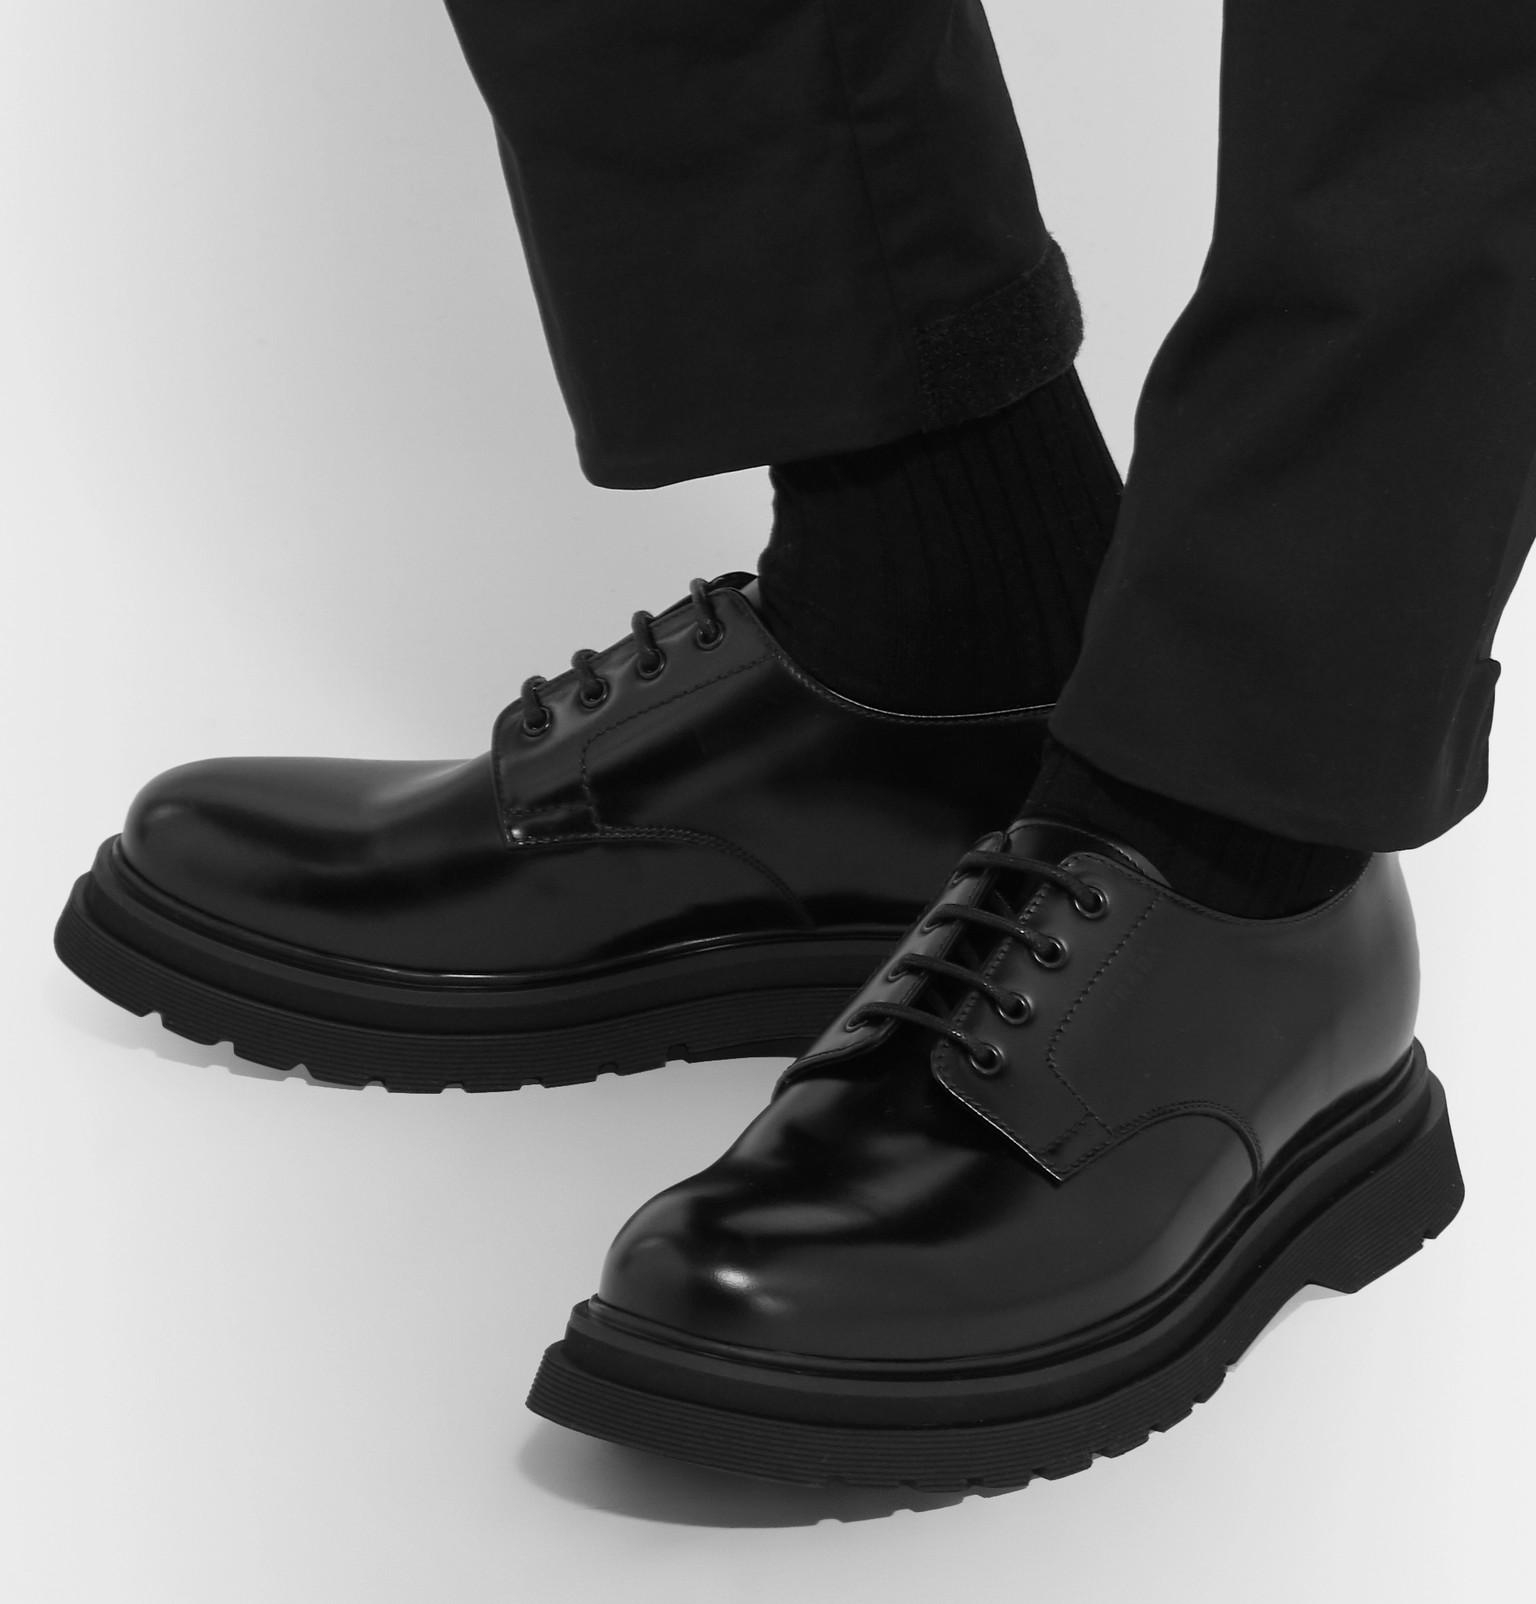 64694890fc97 Prada - Spazzolato Leather Derby Shoes